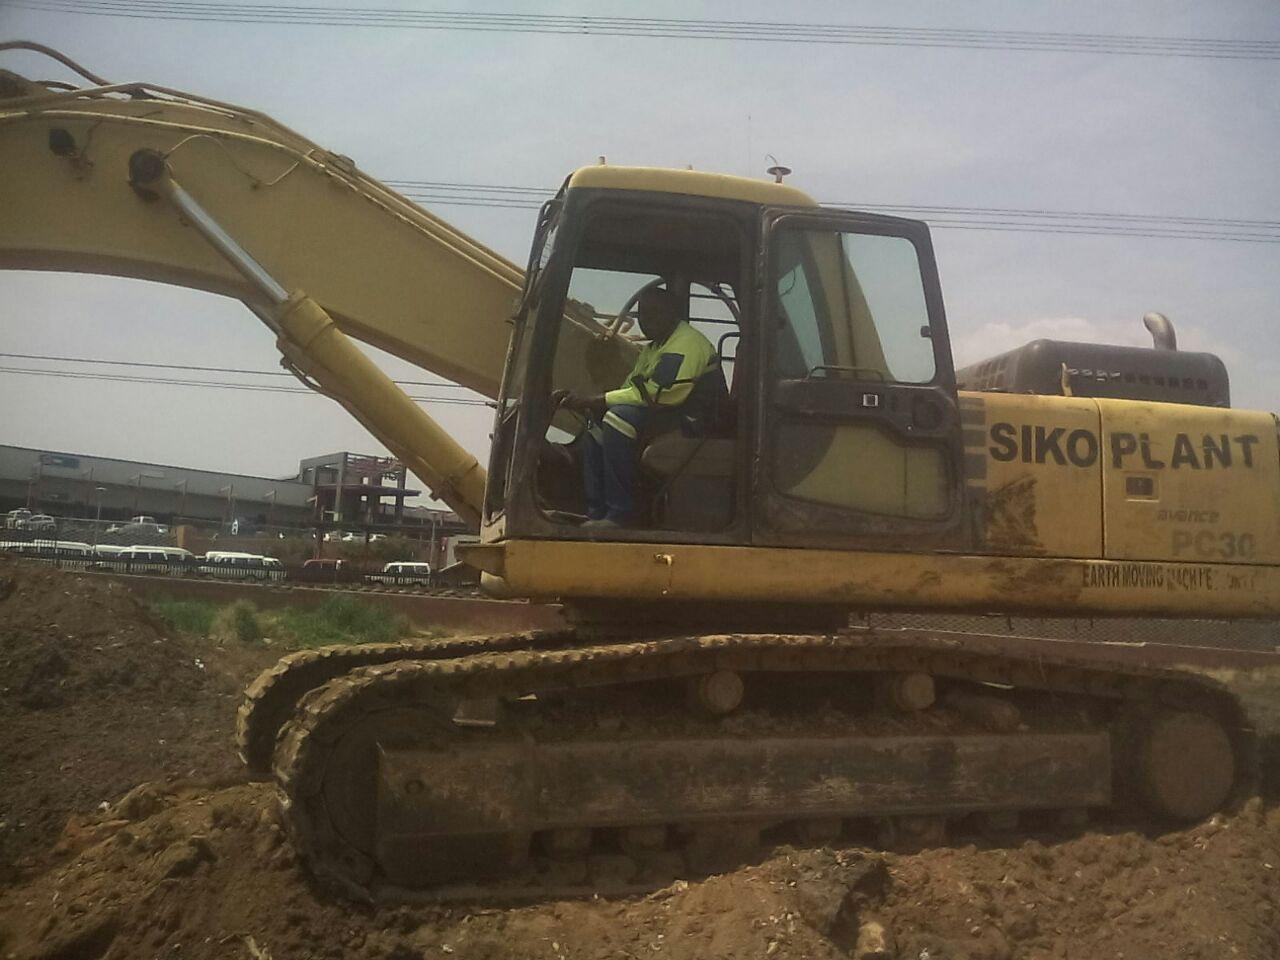 ZIMBABWEAN EXCAVATOR OPERATOR.